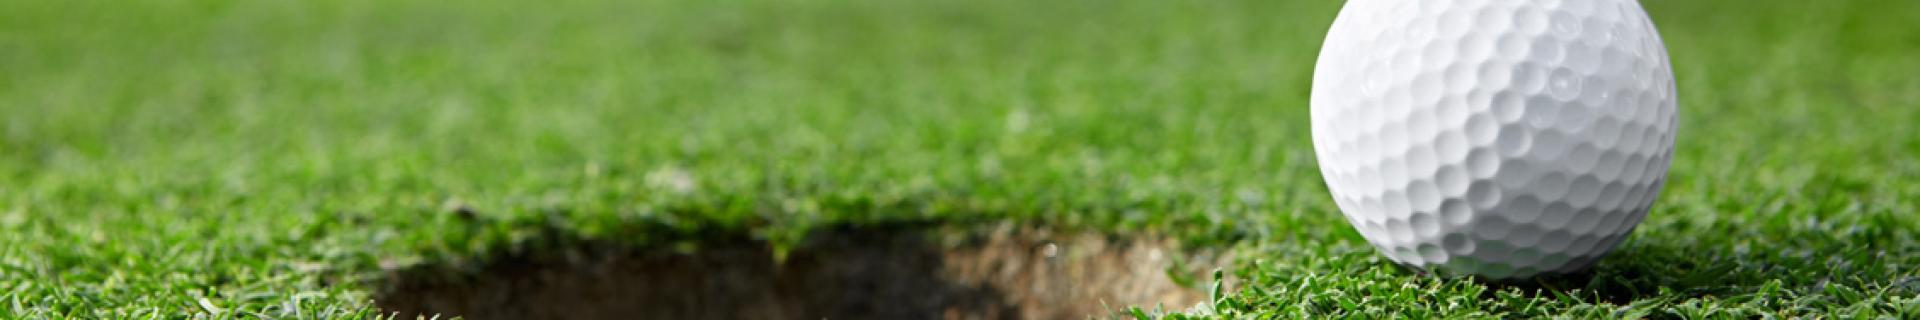 A golf hole and ball